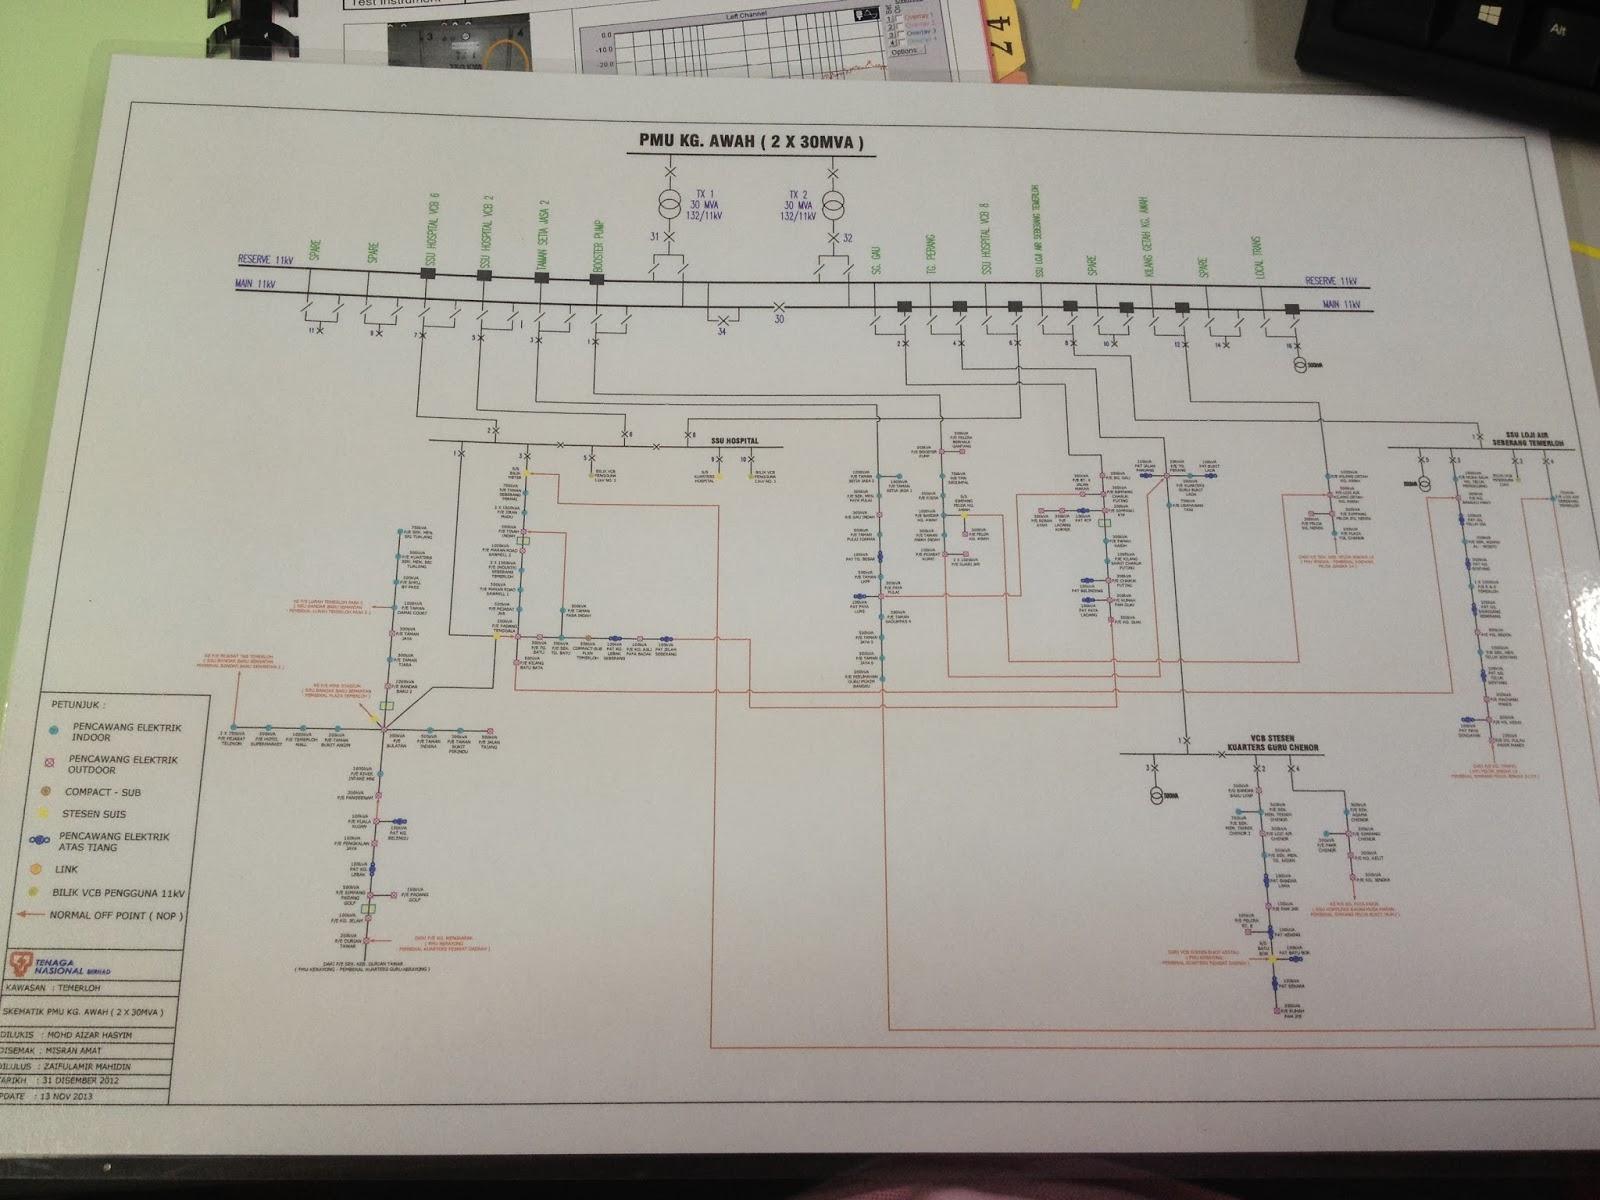 Internship Tnb February 2014 Durant Wiring Diagram Schematic Kg Awah